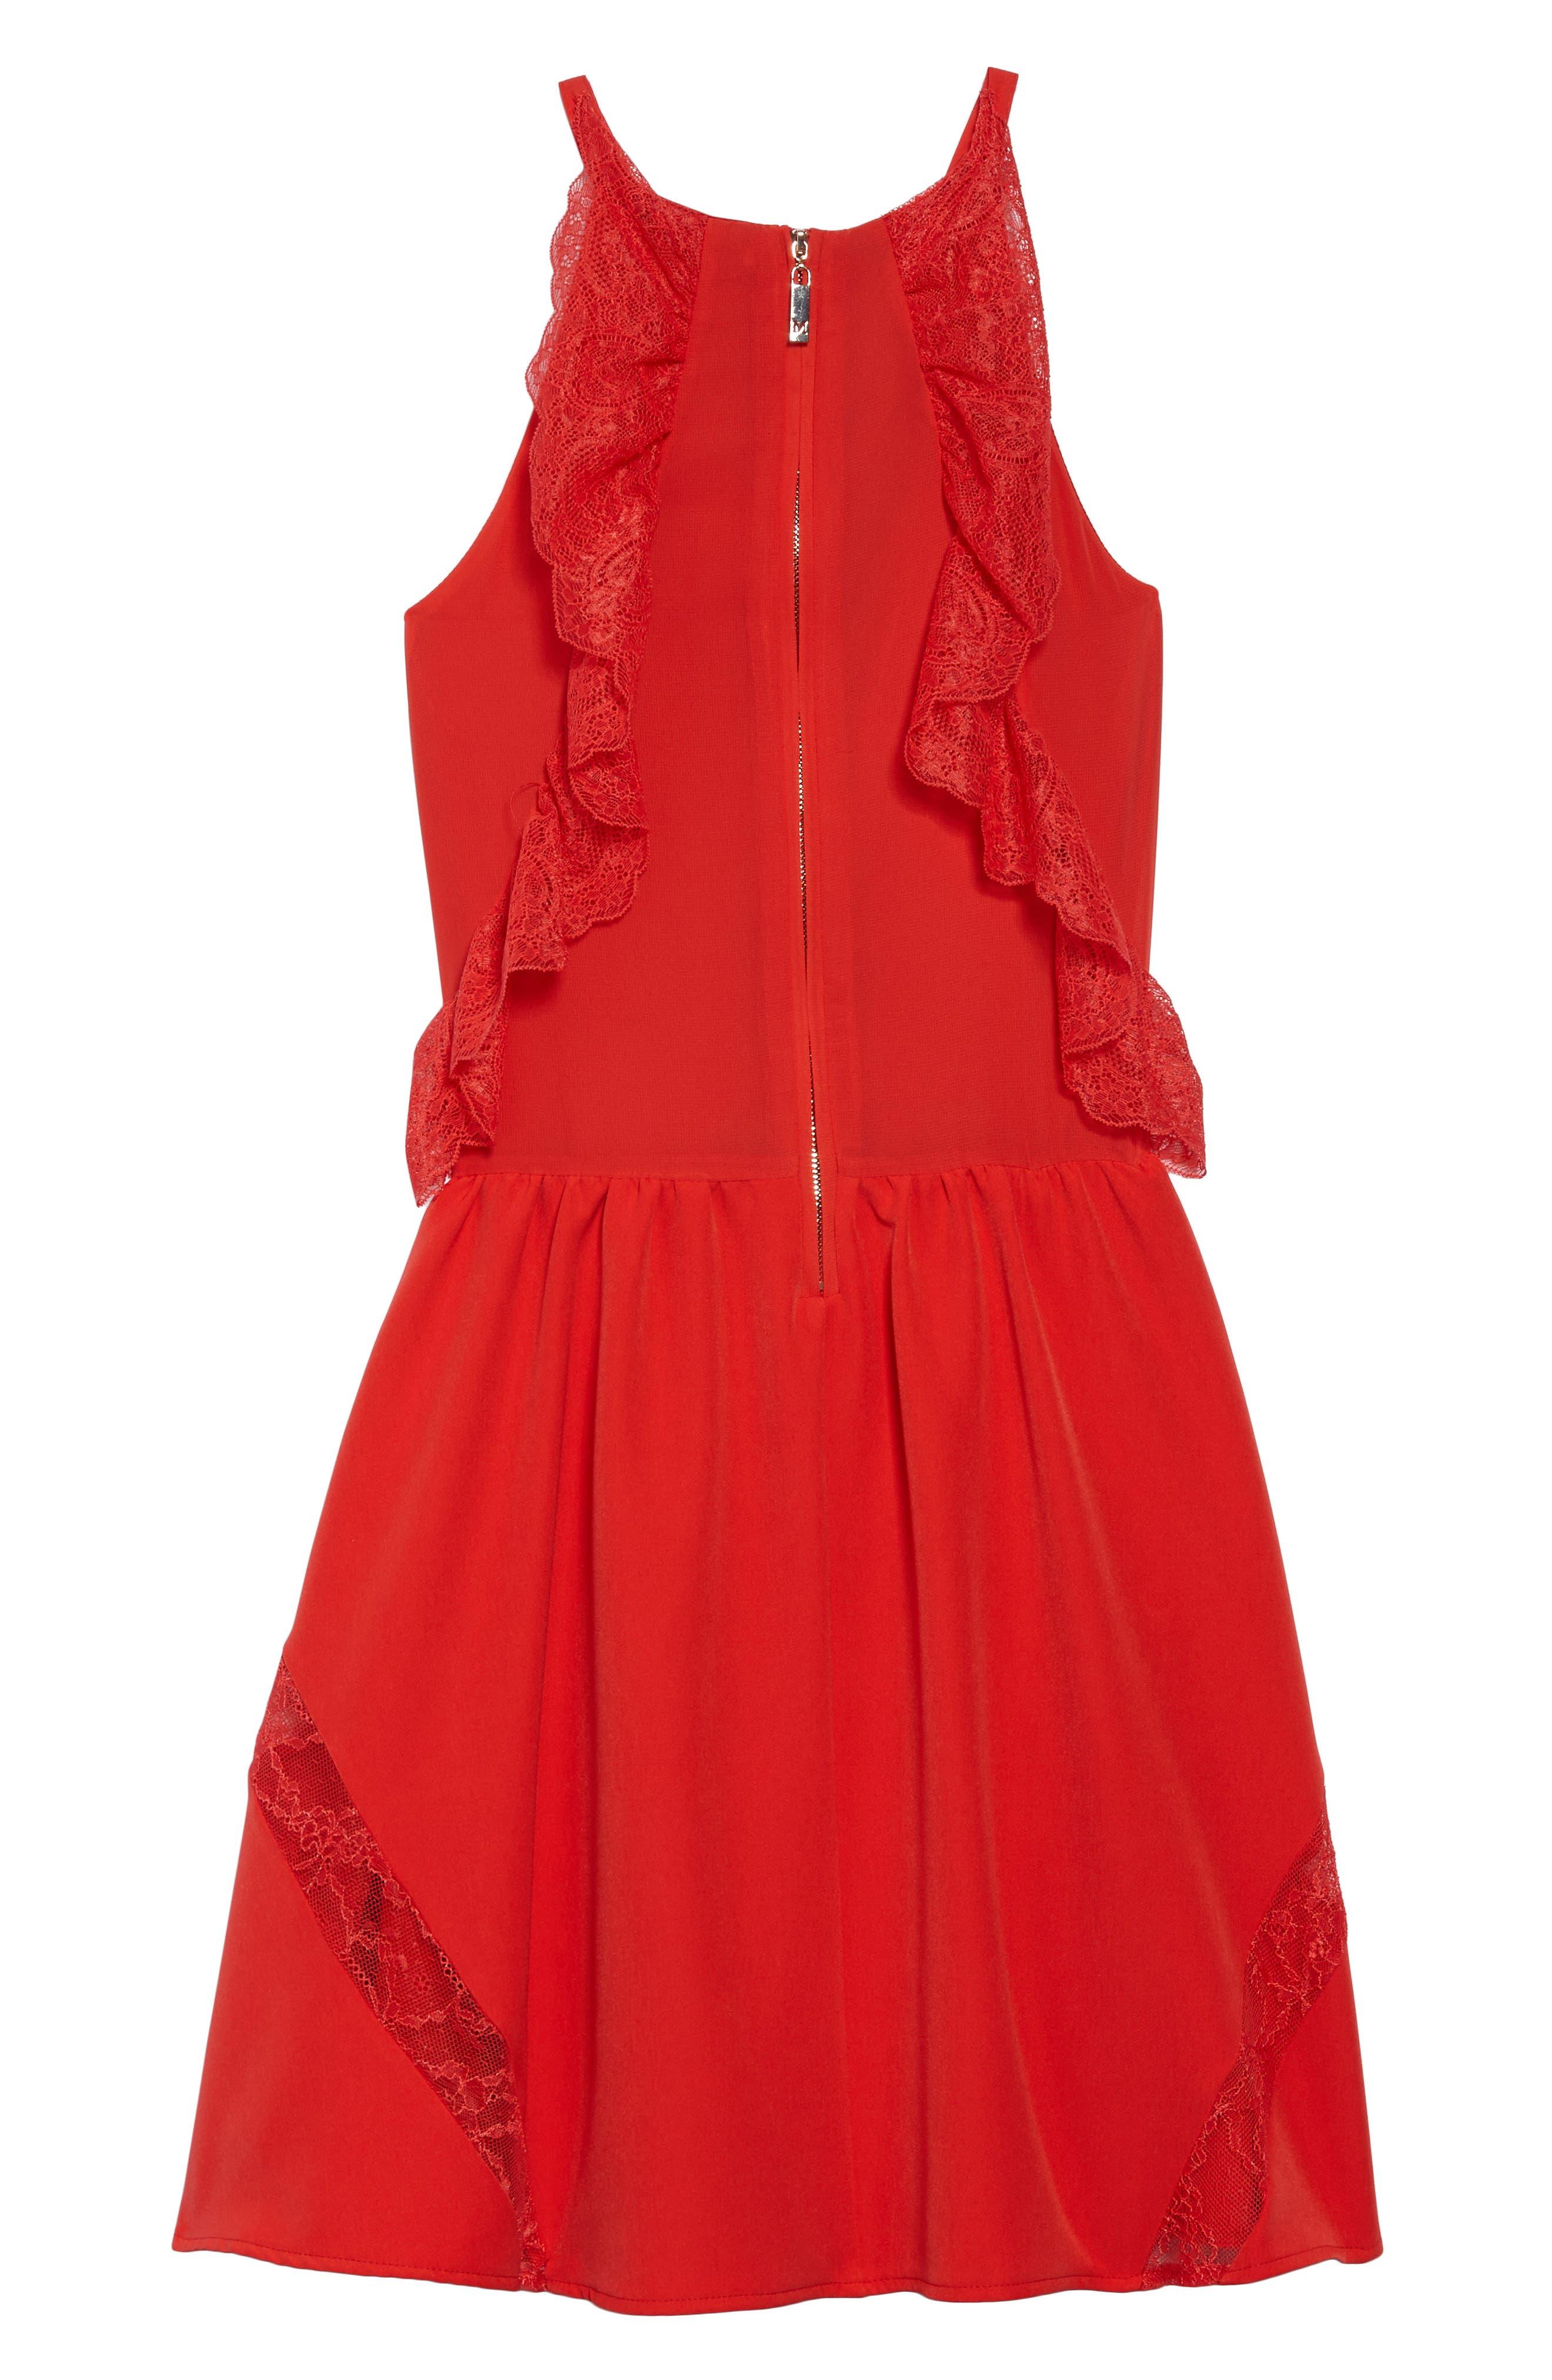 Lace Trimmed Halter Dress,                             Alternate thumbnail 2, color,                             600